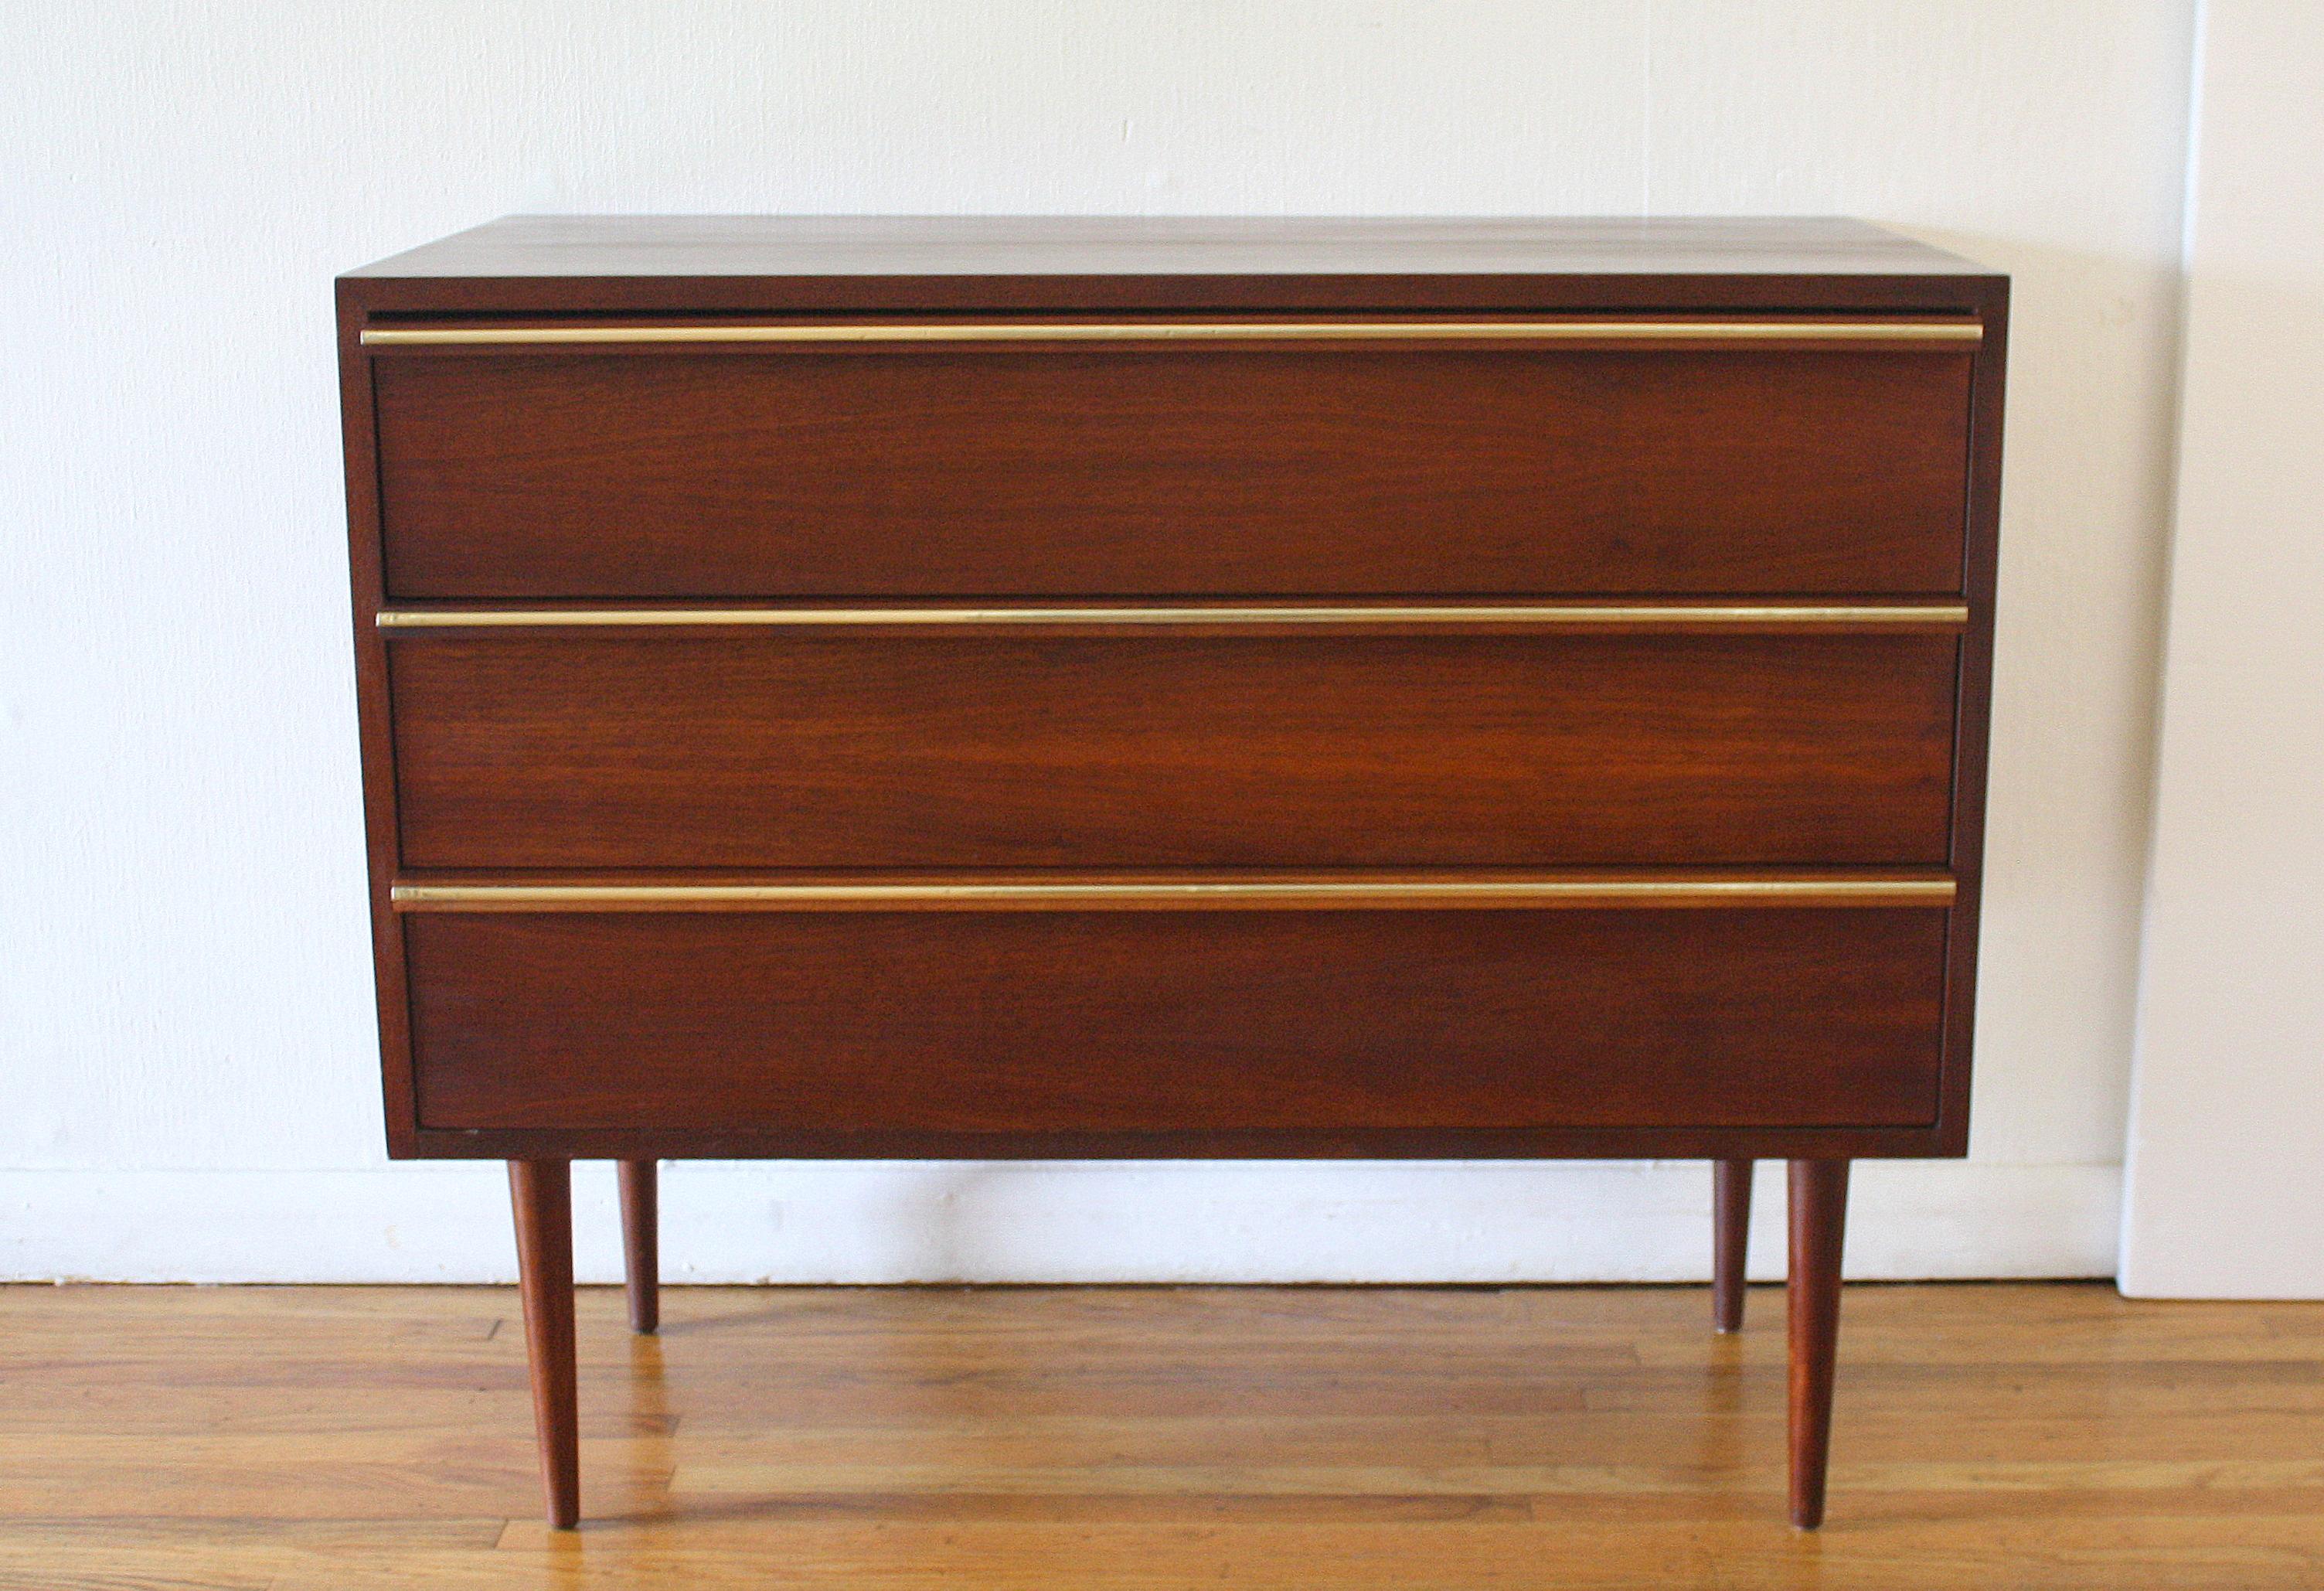 mcm bachelor chest dresser with brass handles 1.JPG